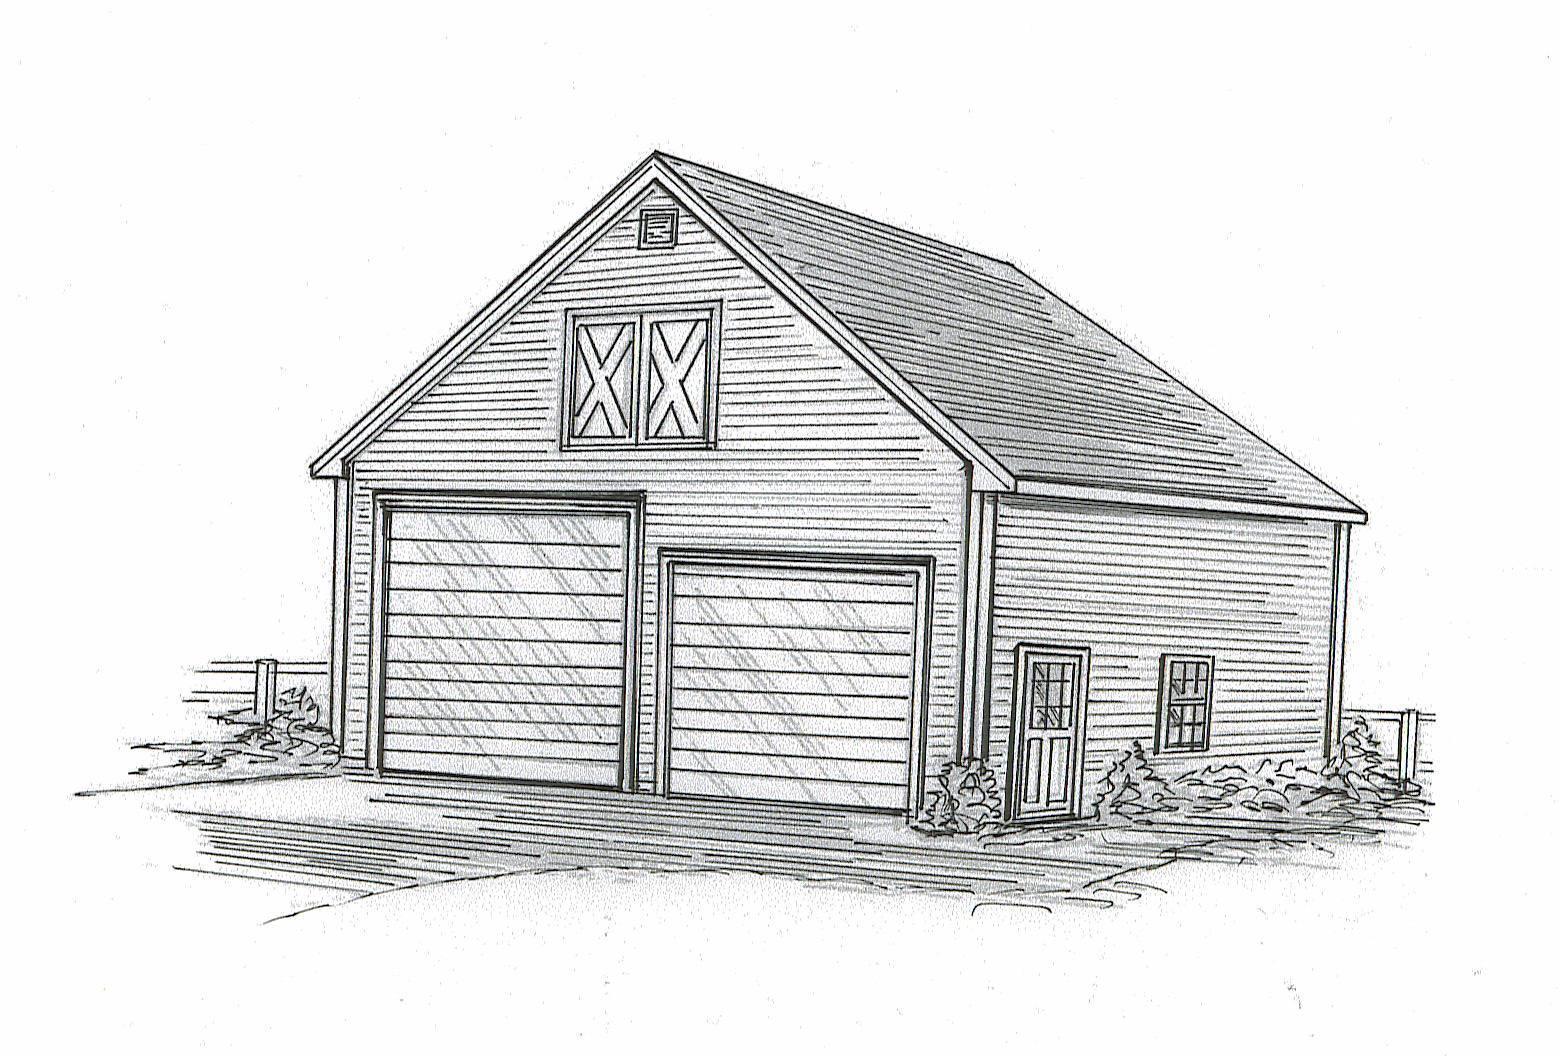 30 x 40 Two Bay FG  RD RV Garage Building Blauprint Plans